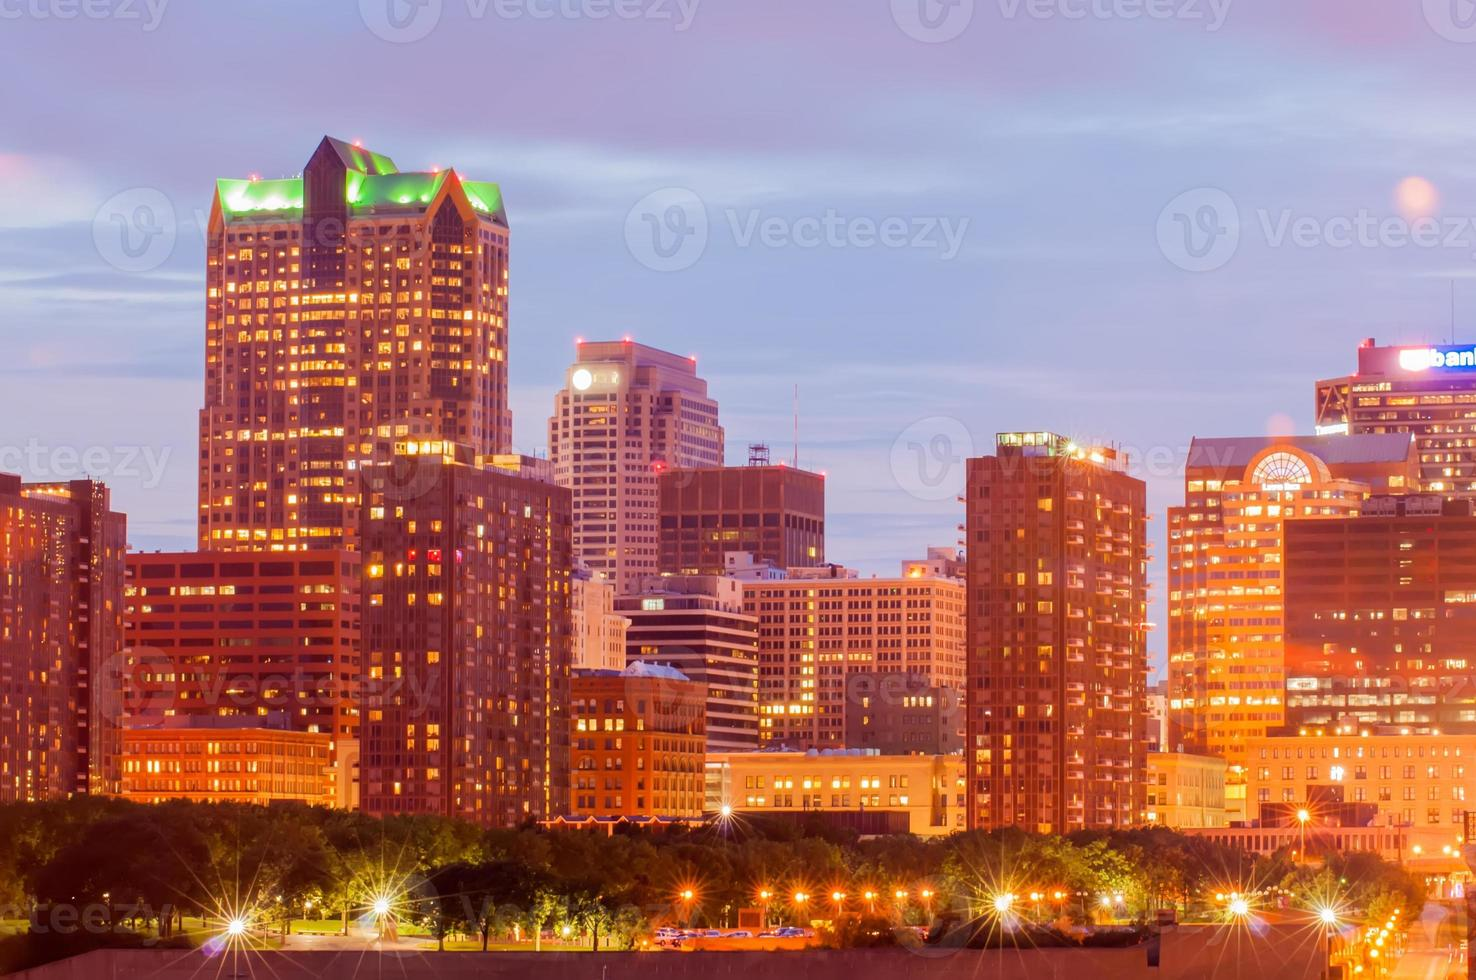 stad van st. Louis skyline. afbeelding van st. Louis foto